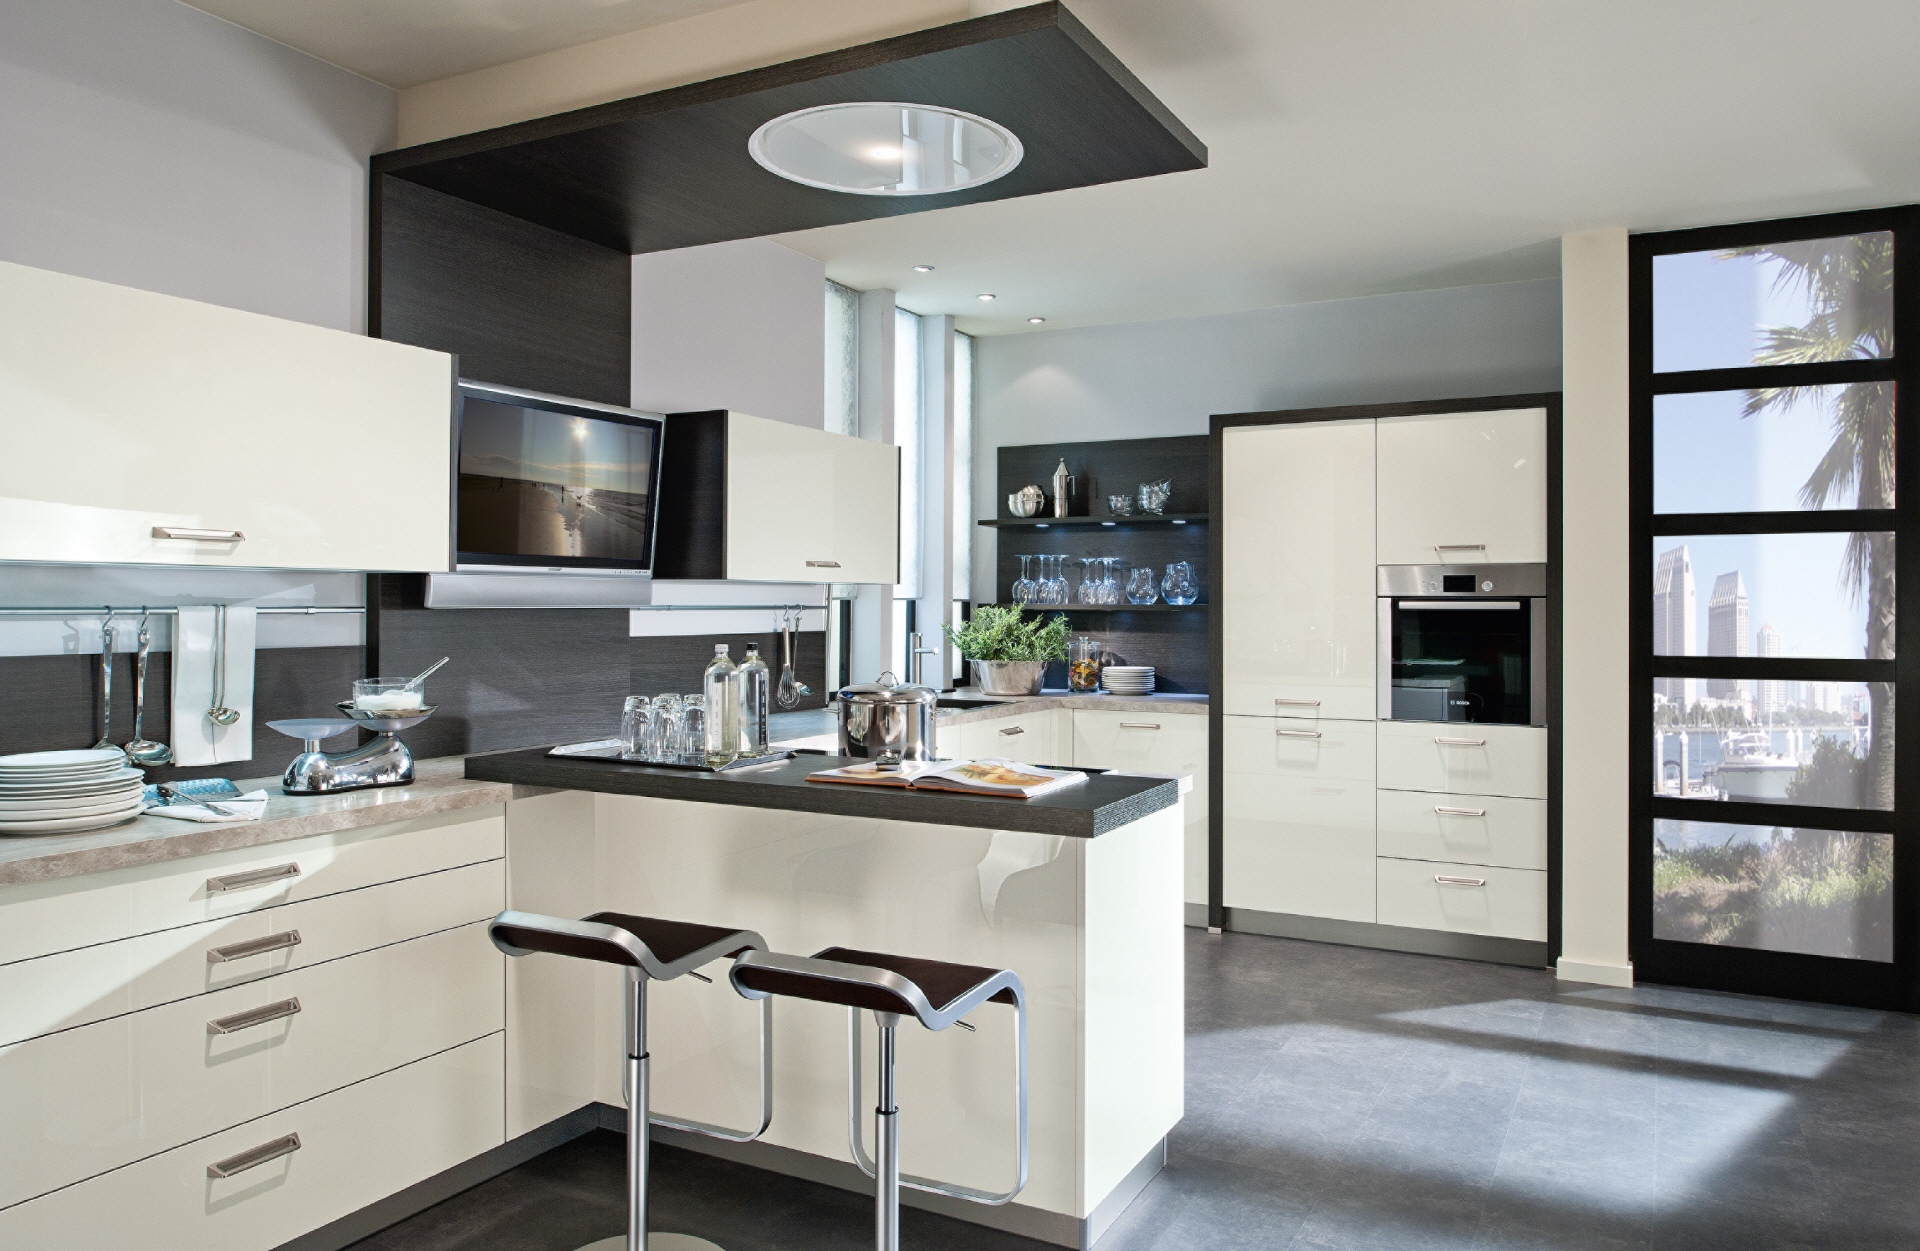 designer k chen p sentiert vom k chenprofi k chenherbert aus storkow. Black Bedroom Furniture Sets. Home Design Ideas